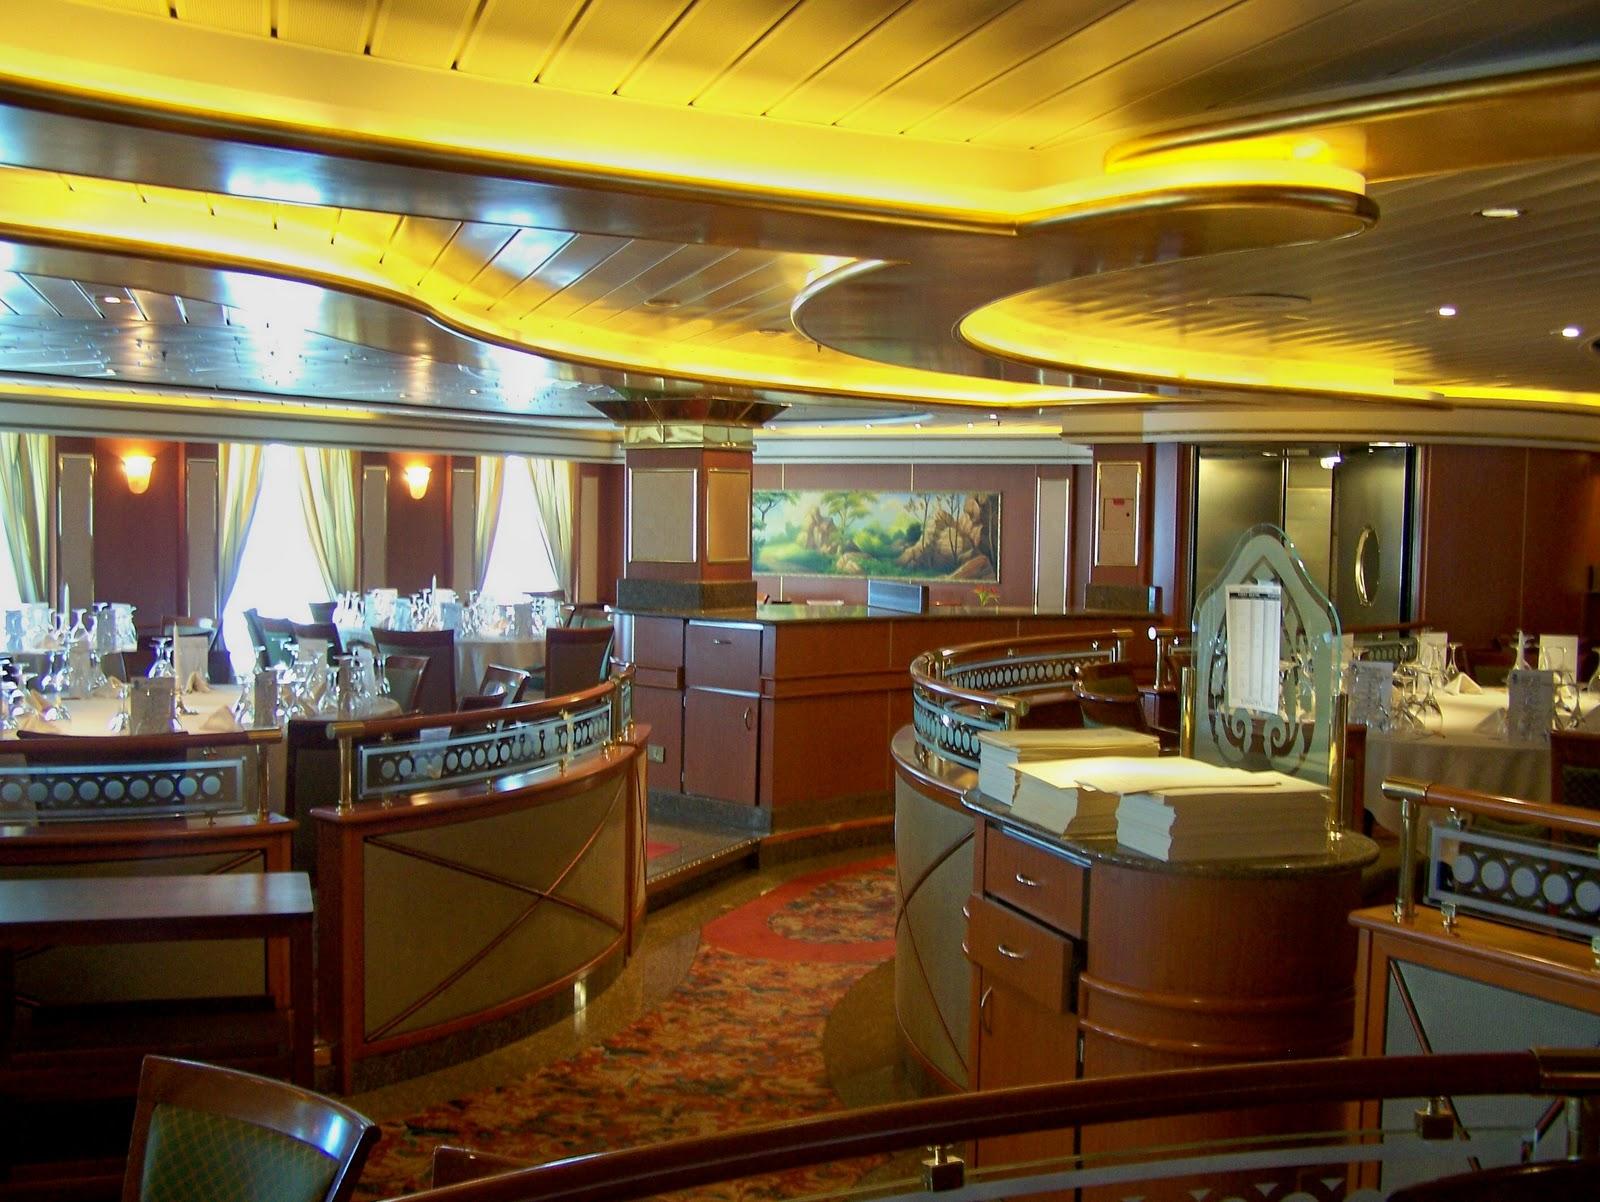 provence dining room | Life's a Trip: Island Princess...Days at Sea....